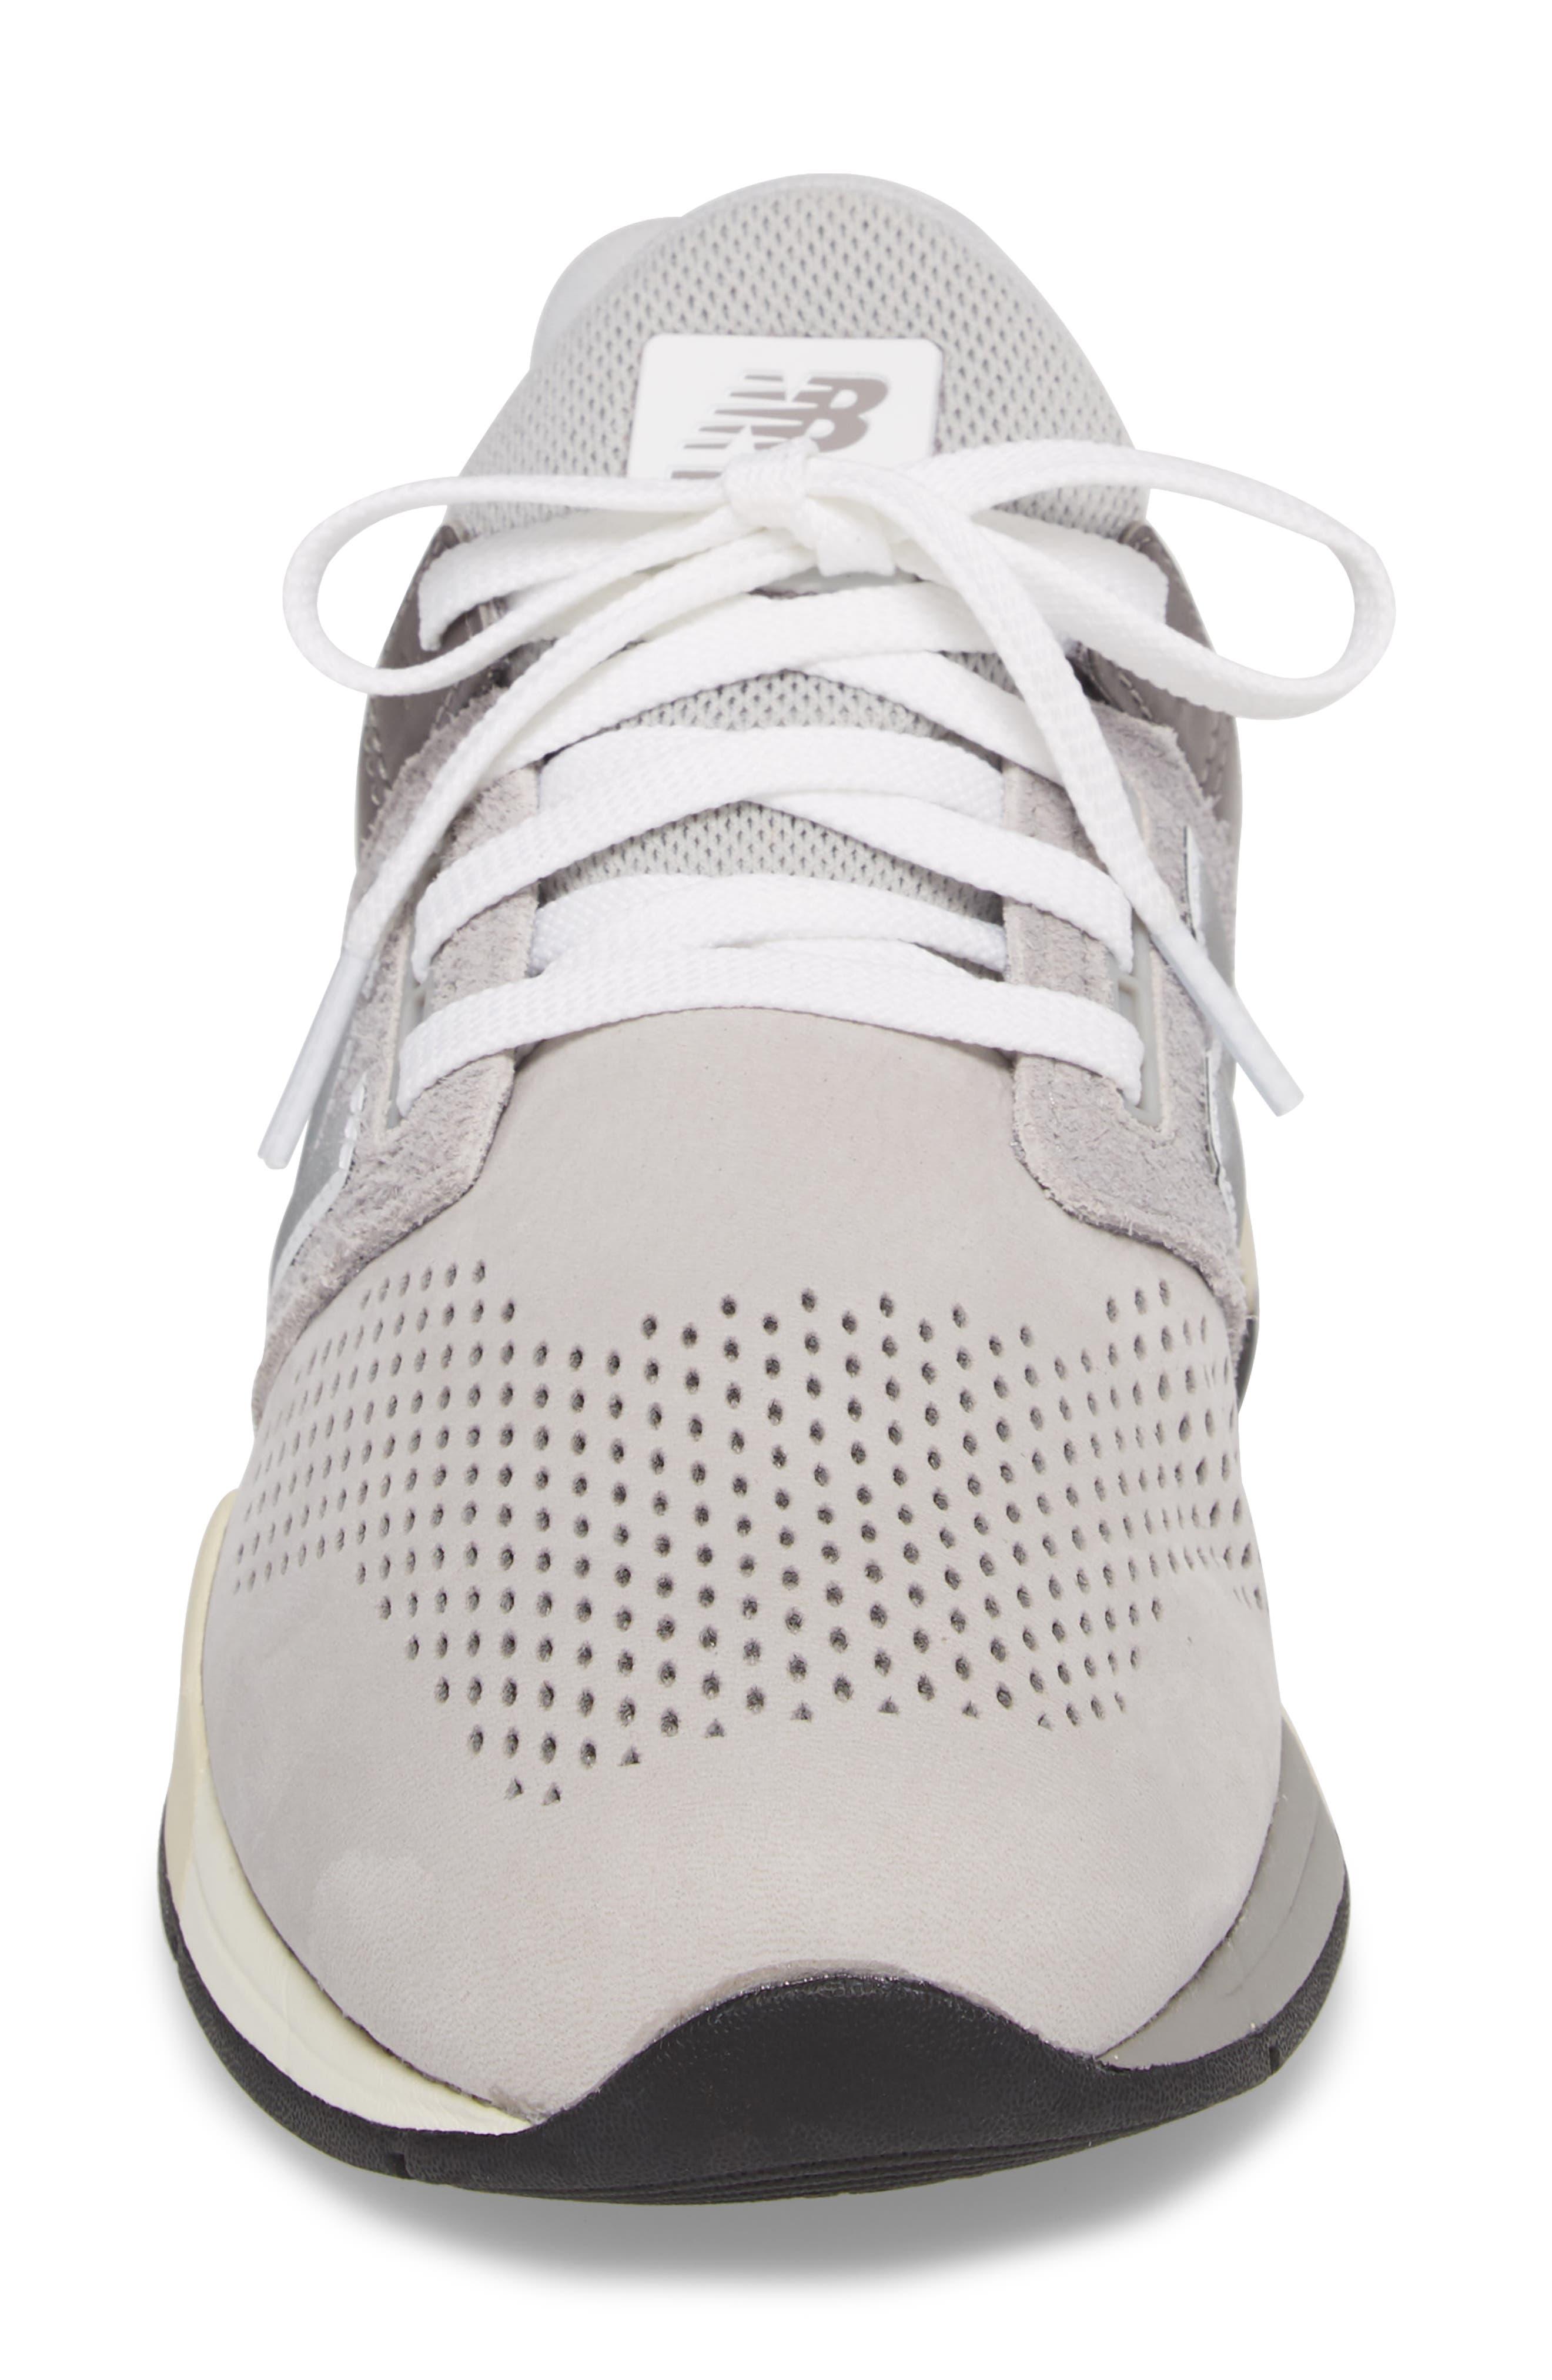 247 v2 Sneaker,                             Alternate thumbnail 5, color,                             Rain Cloud Leather